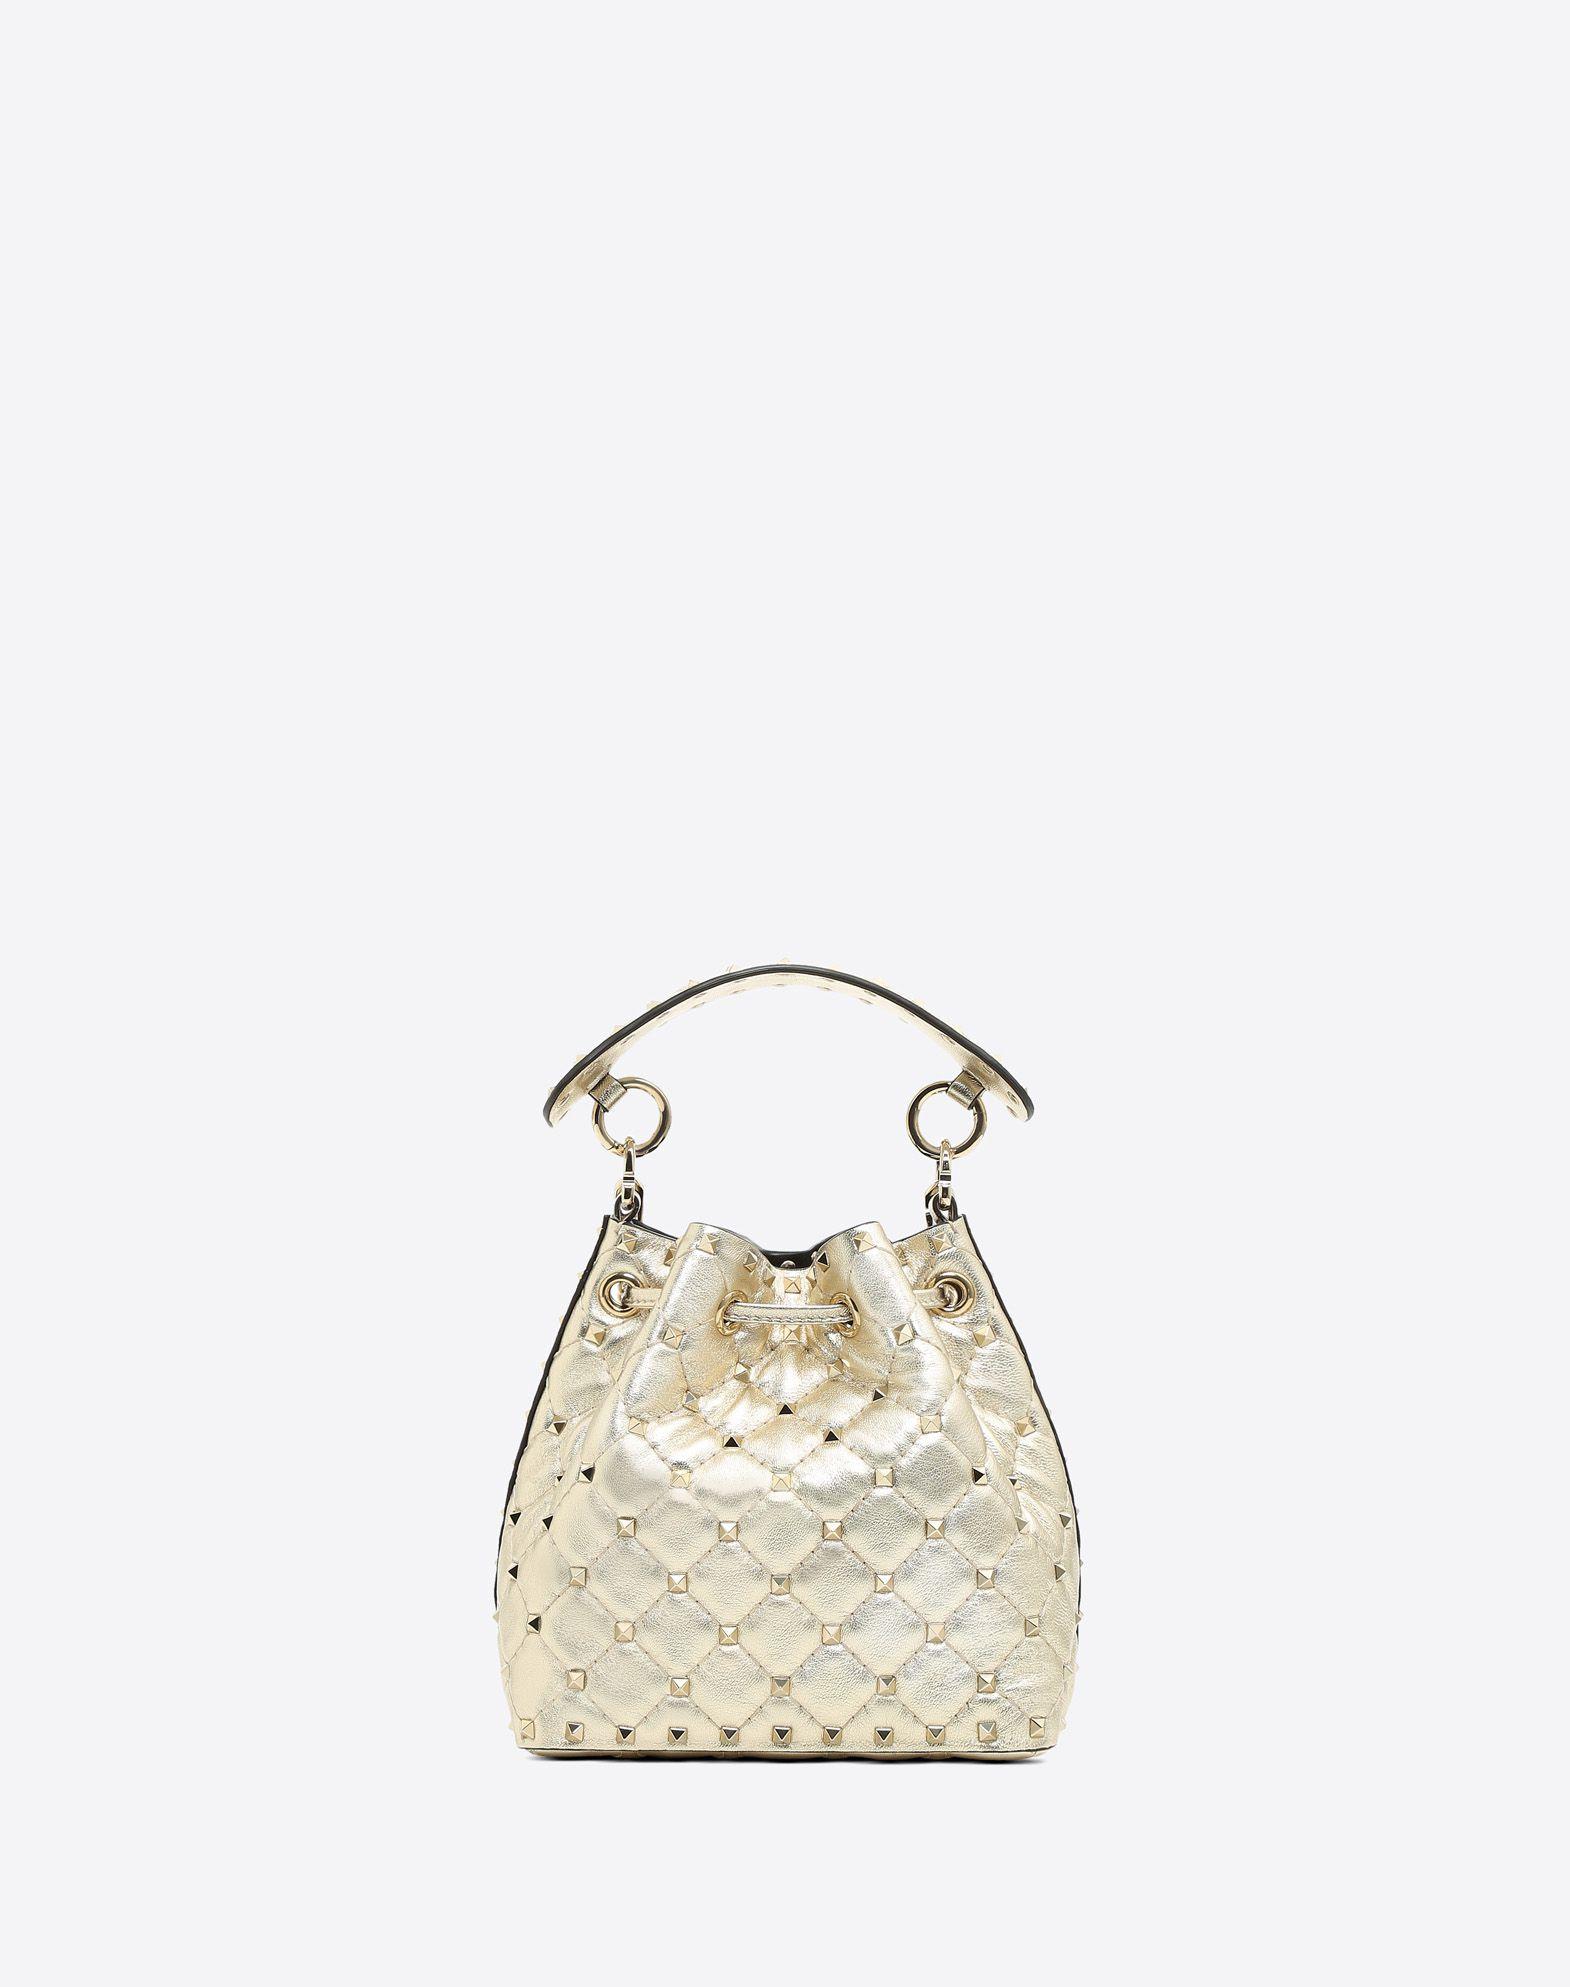 VALENTINO GARAVANI Rockstud Spike Small Bucket Bag  BUCKET BAG D d